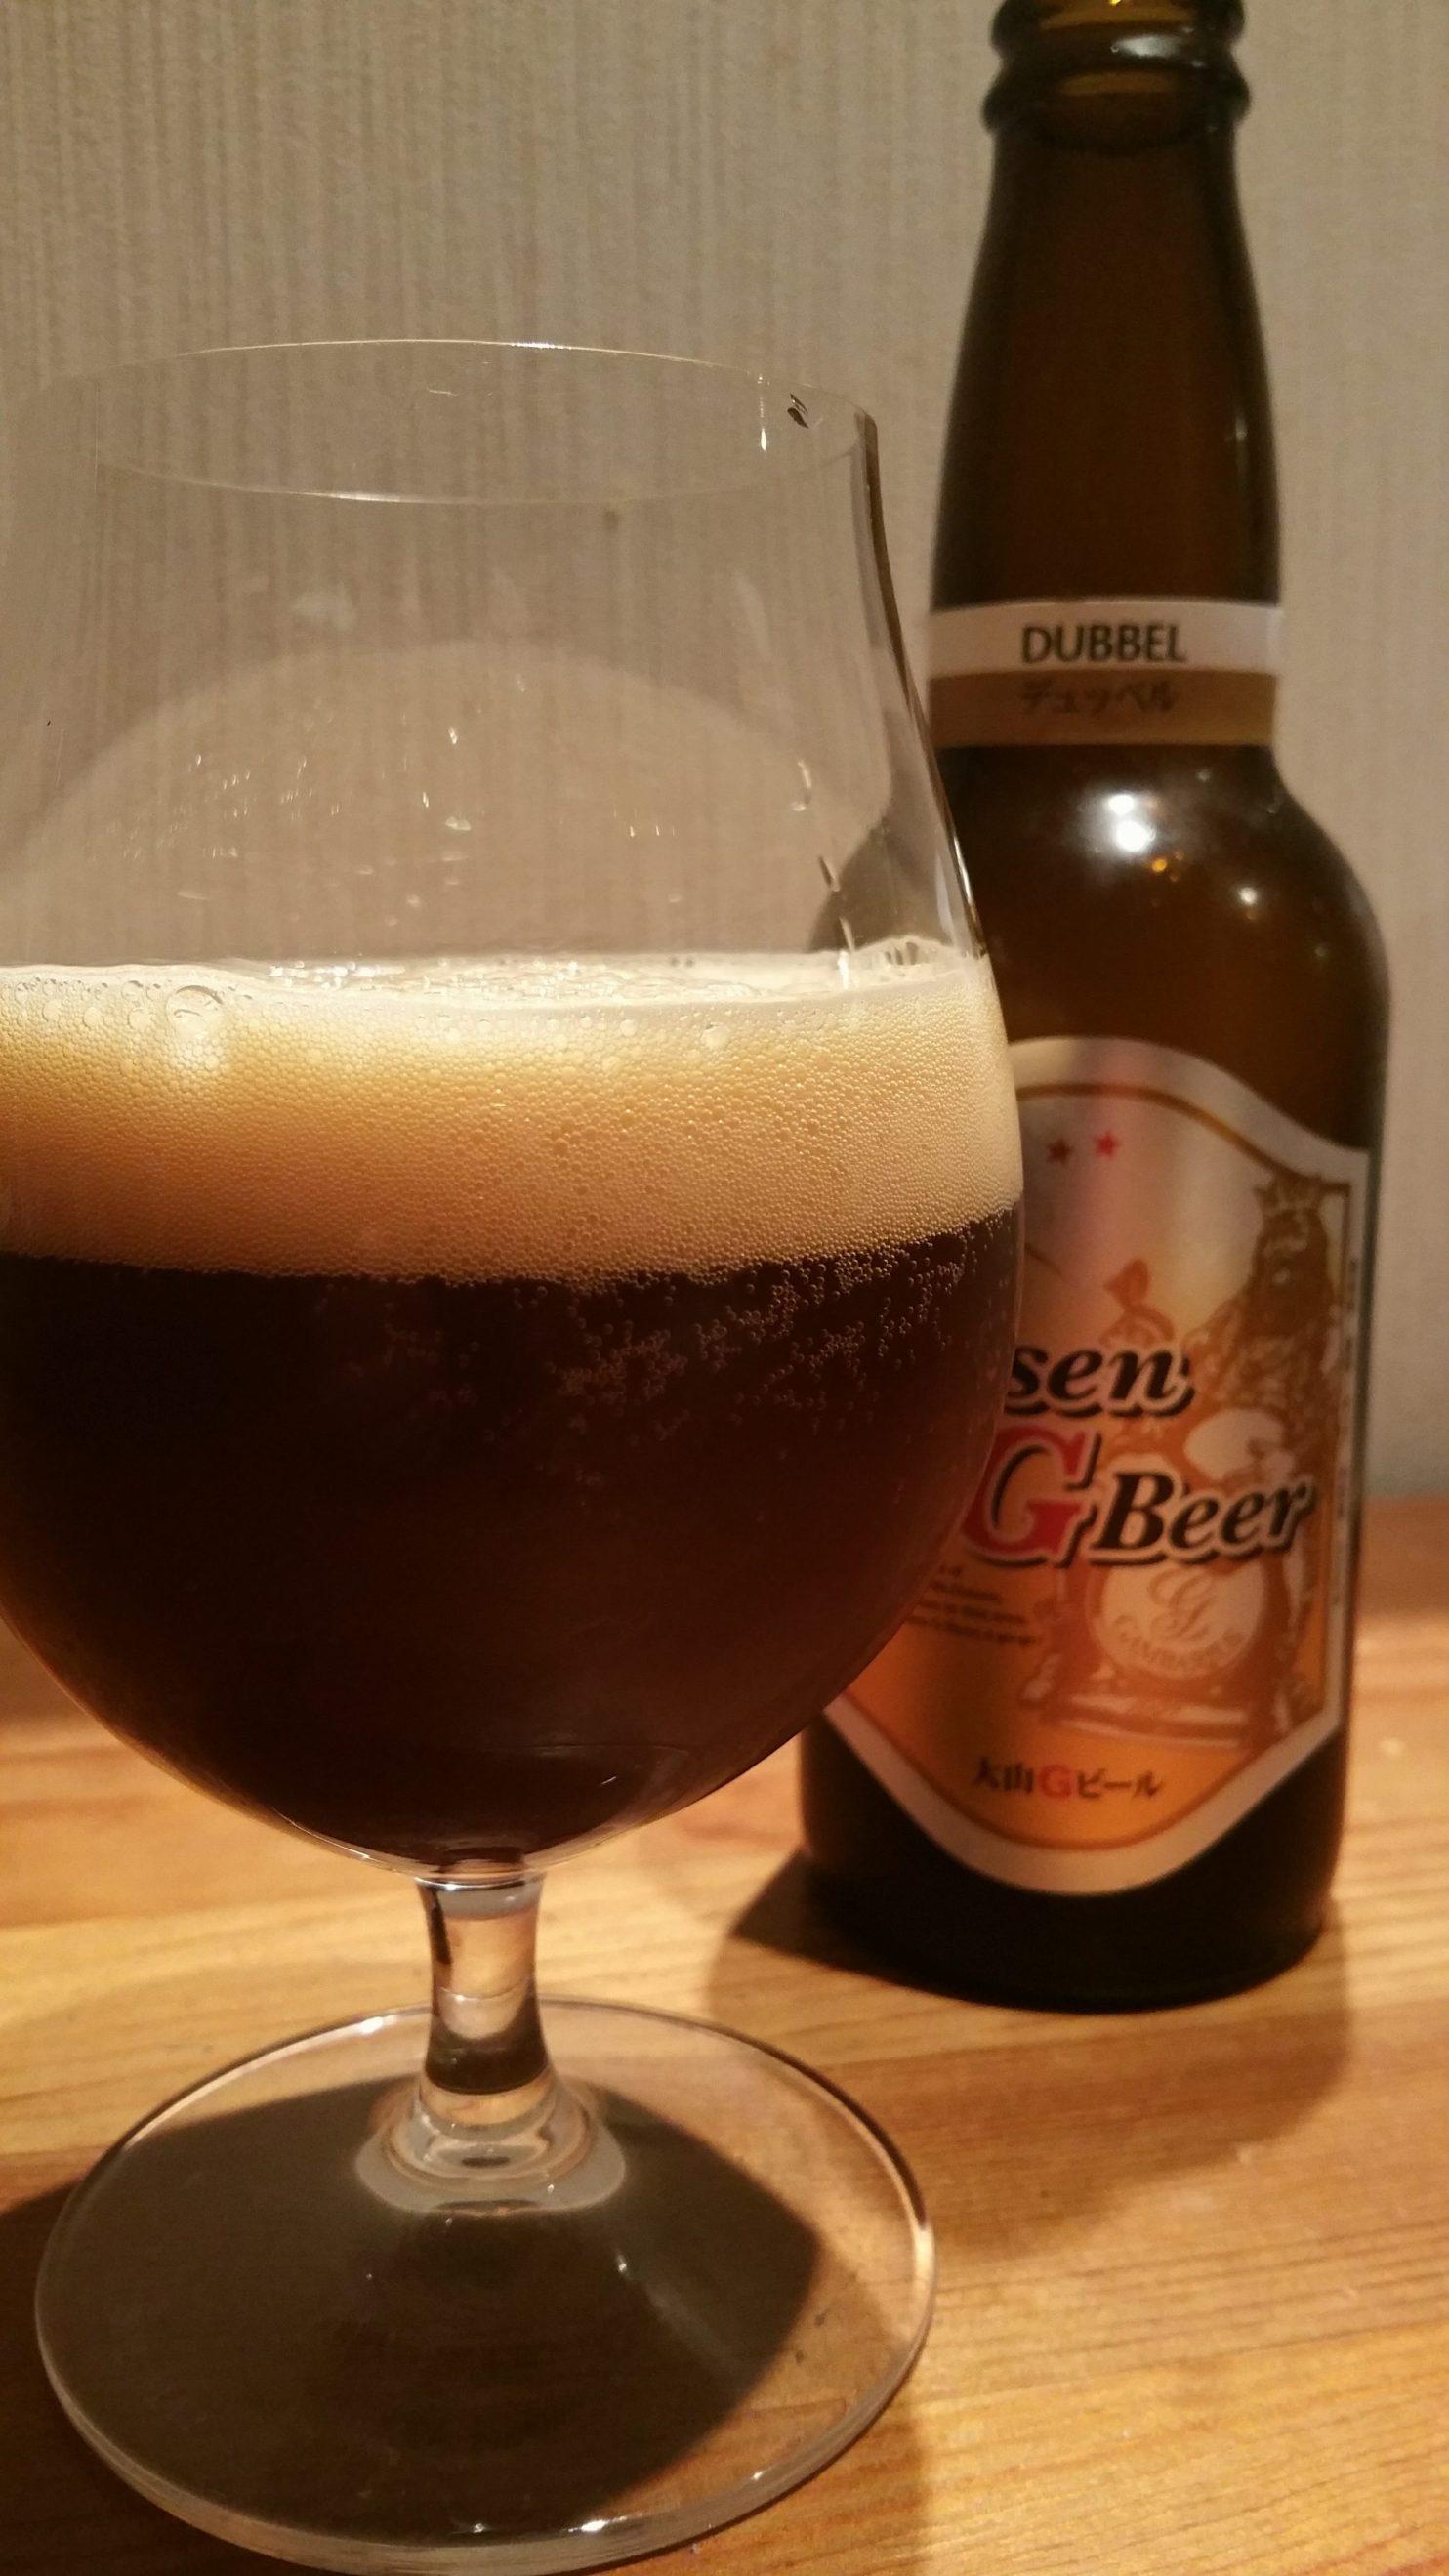 Daisen G Beer Dubbel 大山Gビールデュッベル